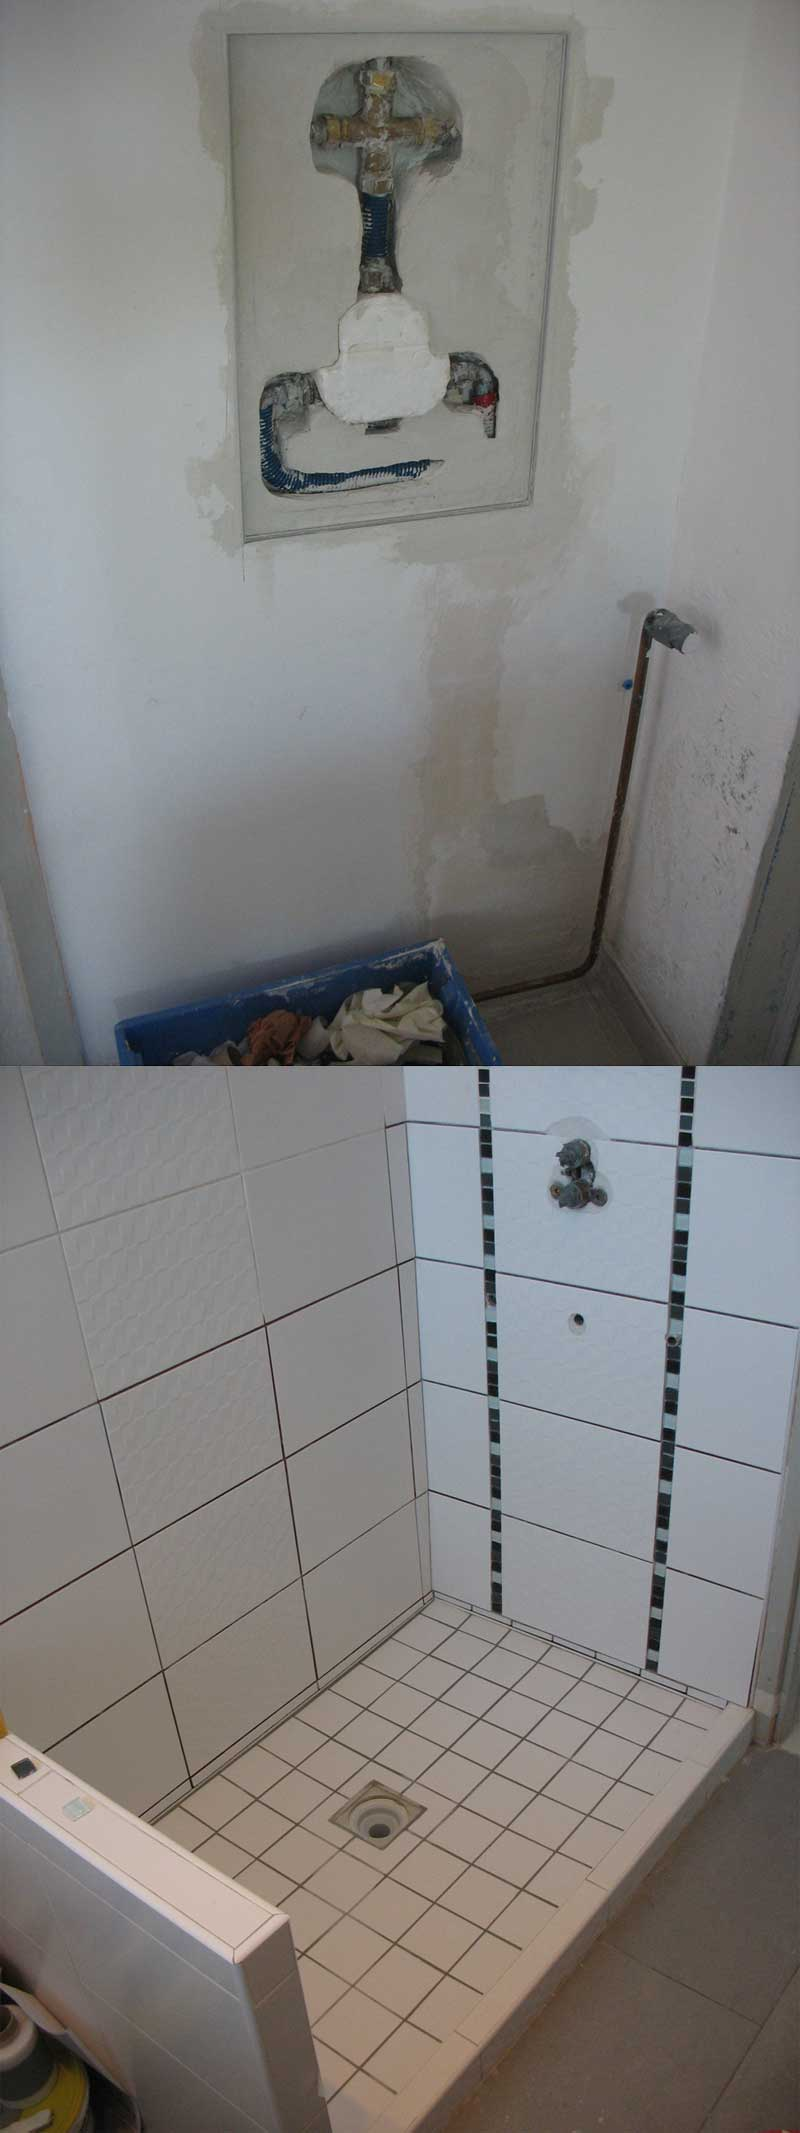 fuite installation douche encastree | Forum Plomberie - Sanitaires ...